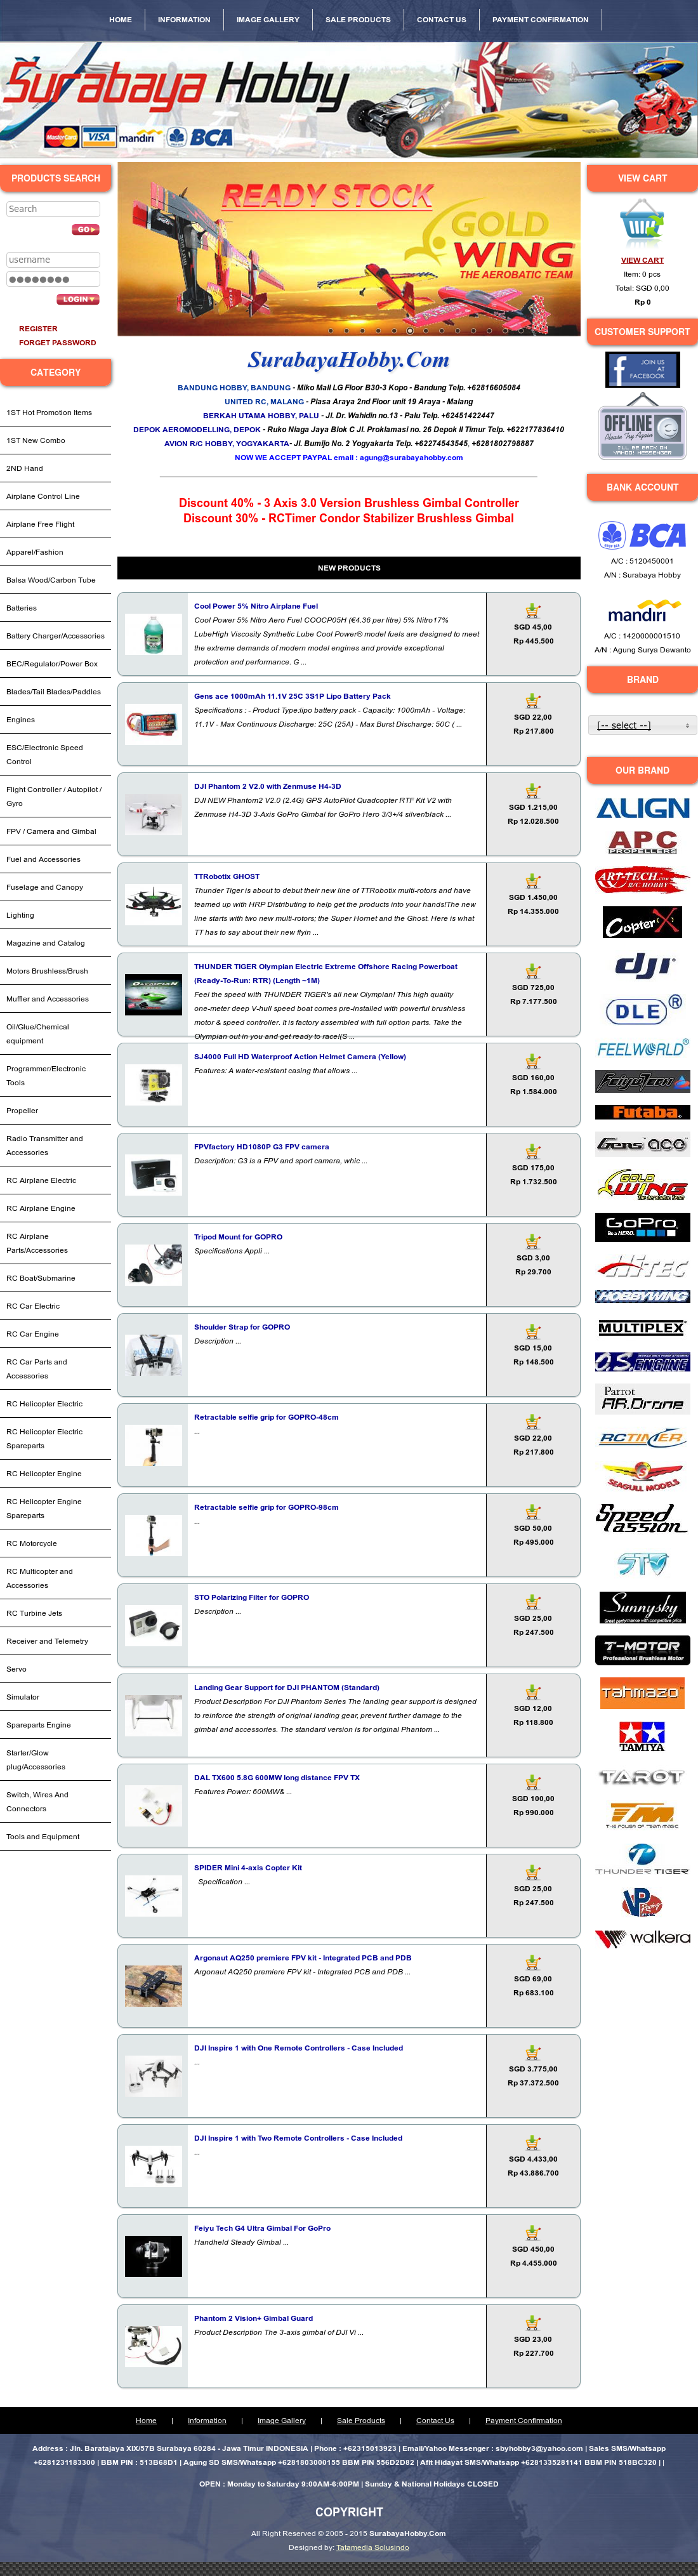 Surabaya Hobby Competitors, Revenue and Employees - Owler